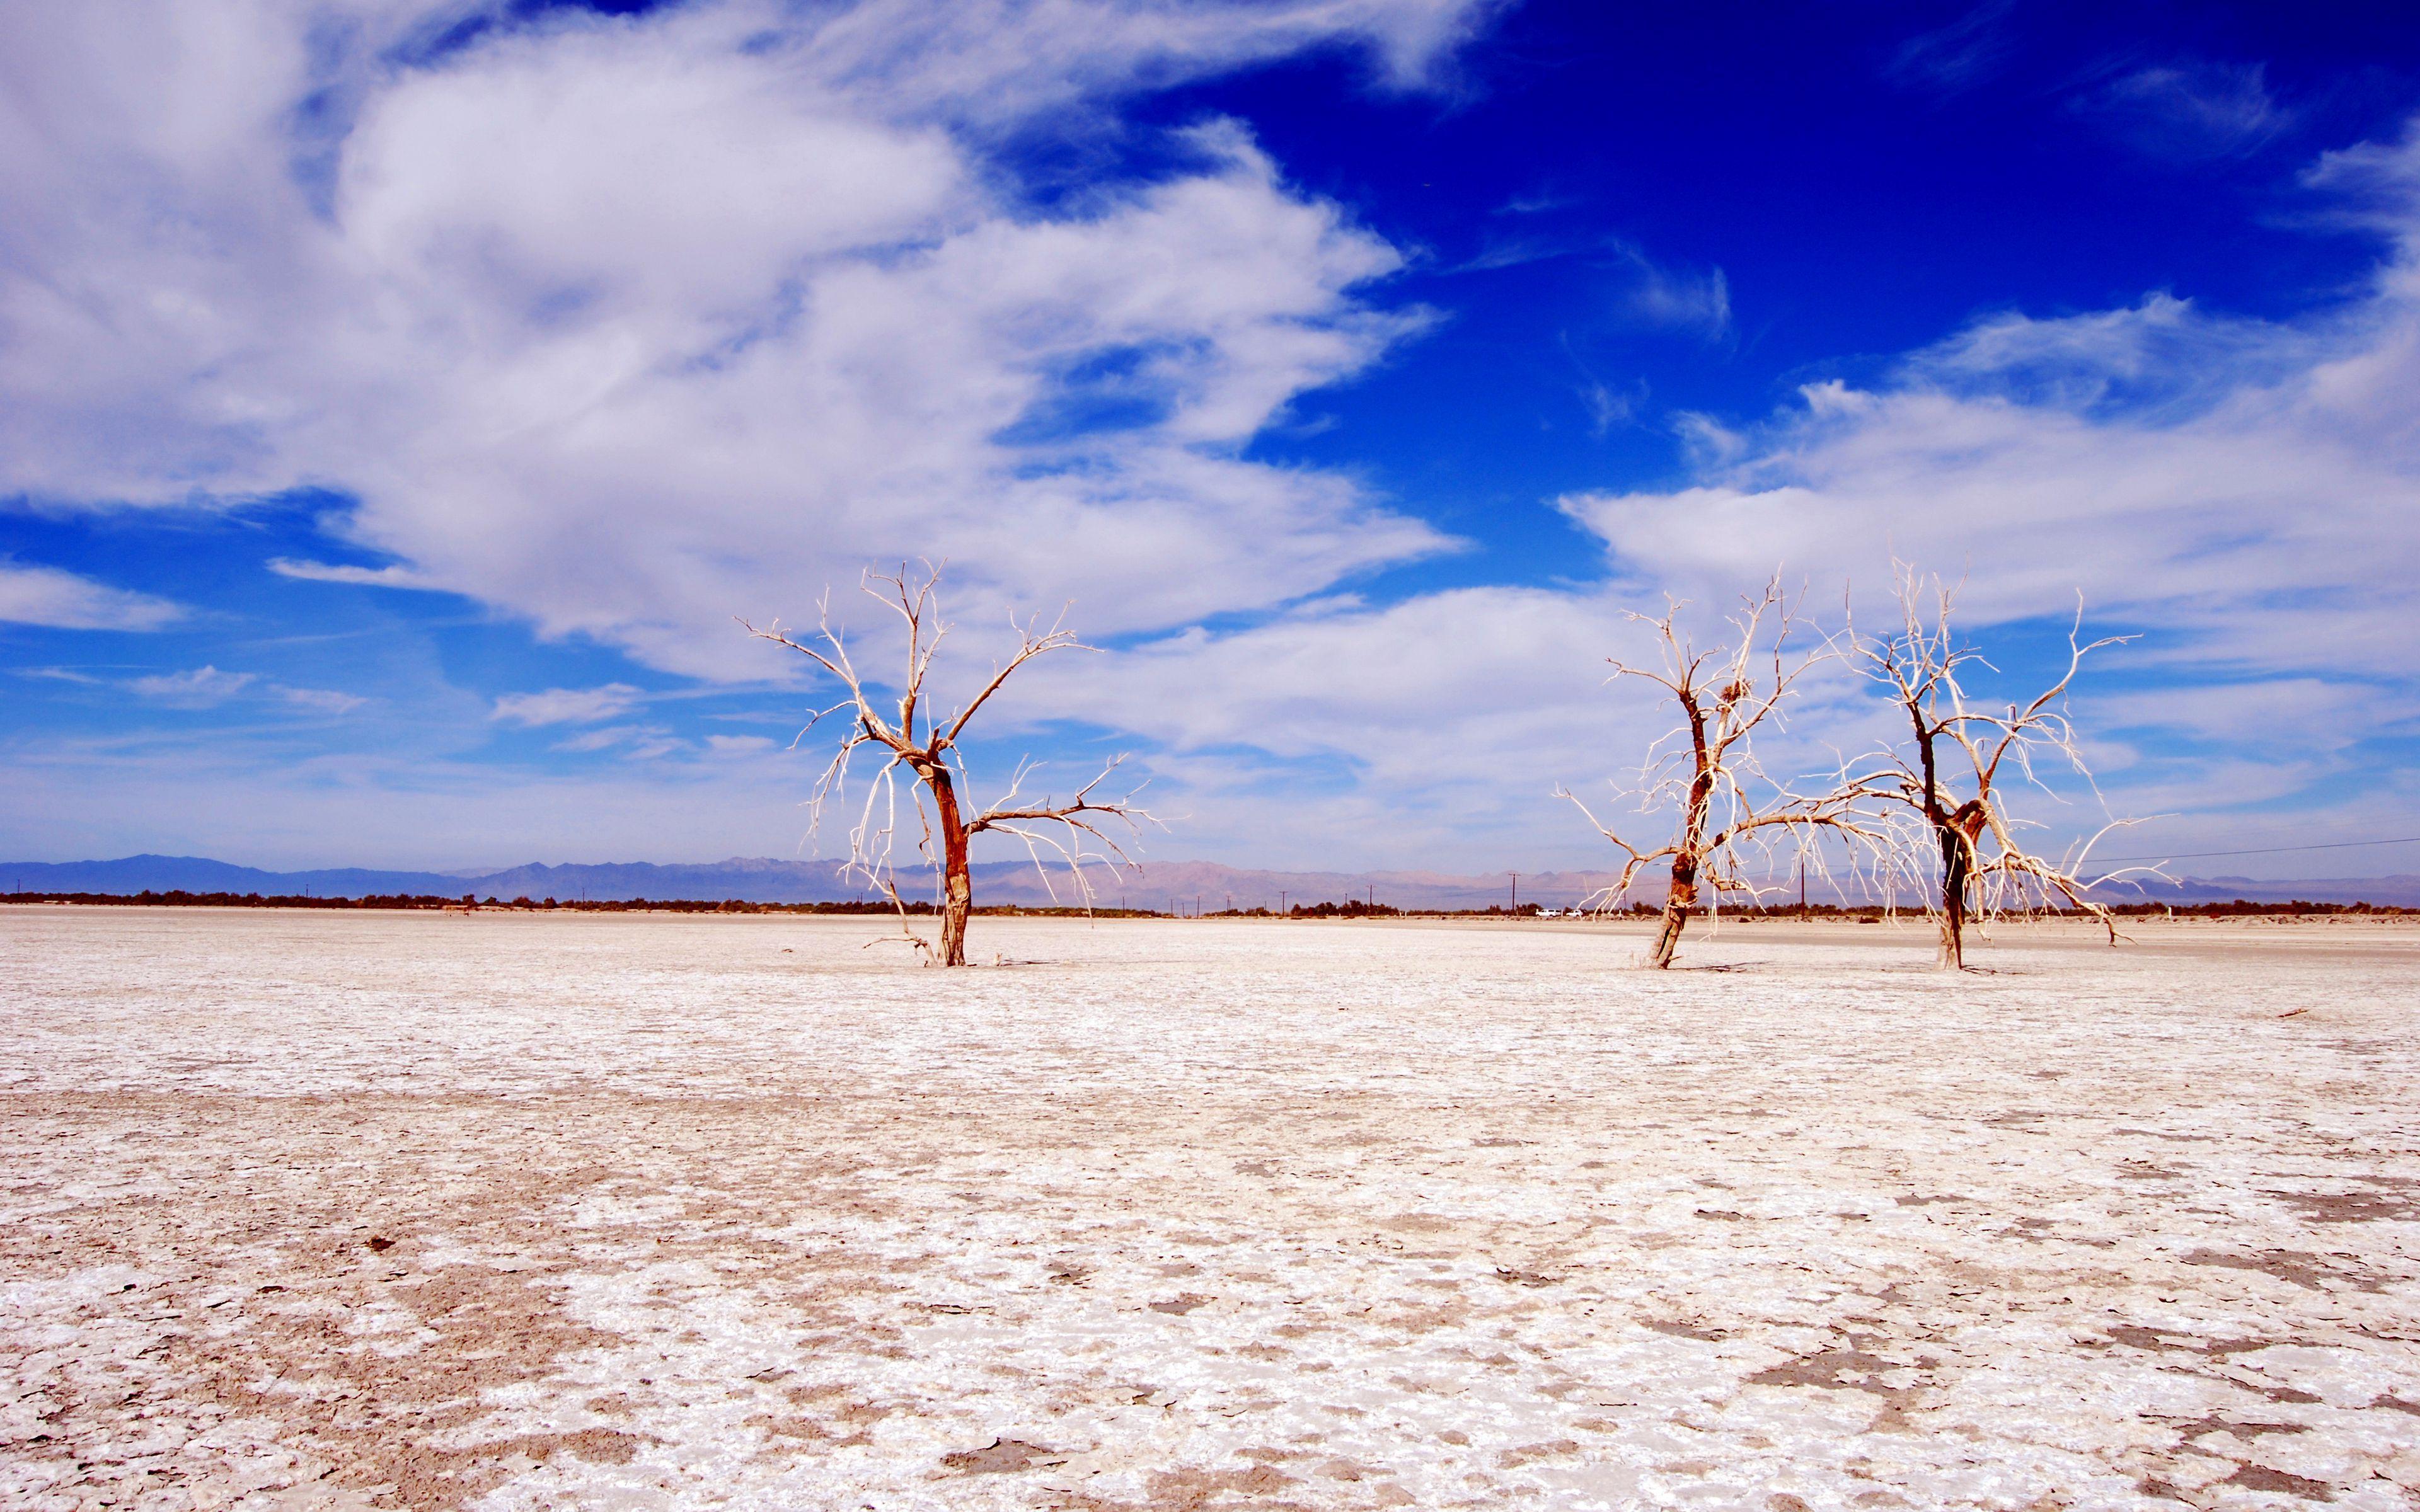 Desert Tree Sky HD Wallpapers - Wallpaper Cave